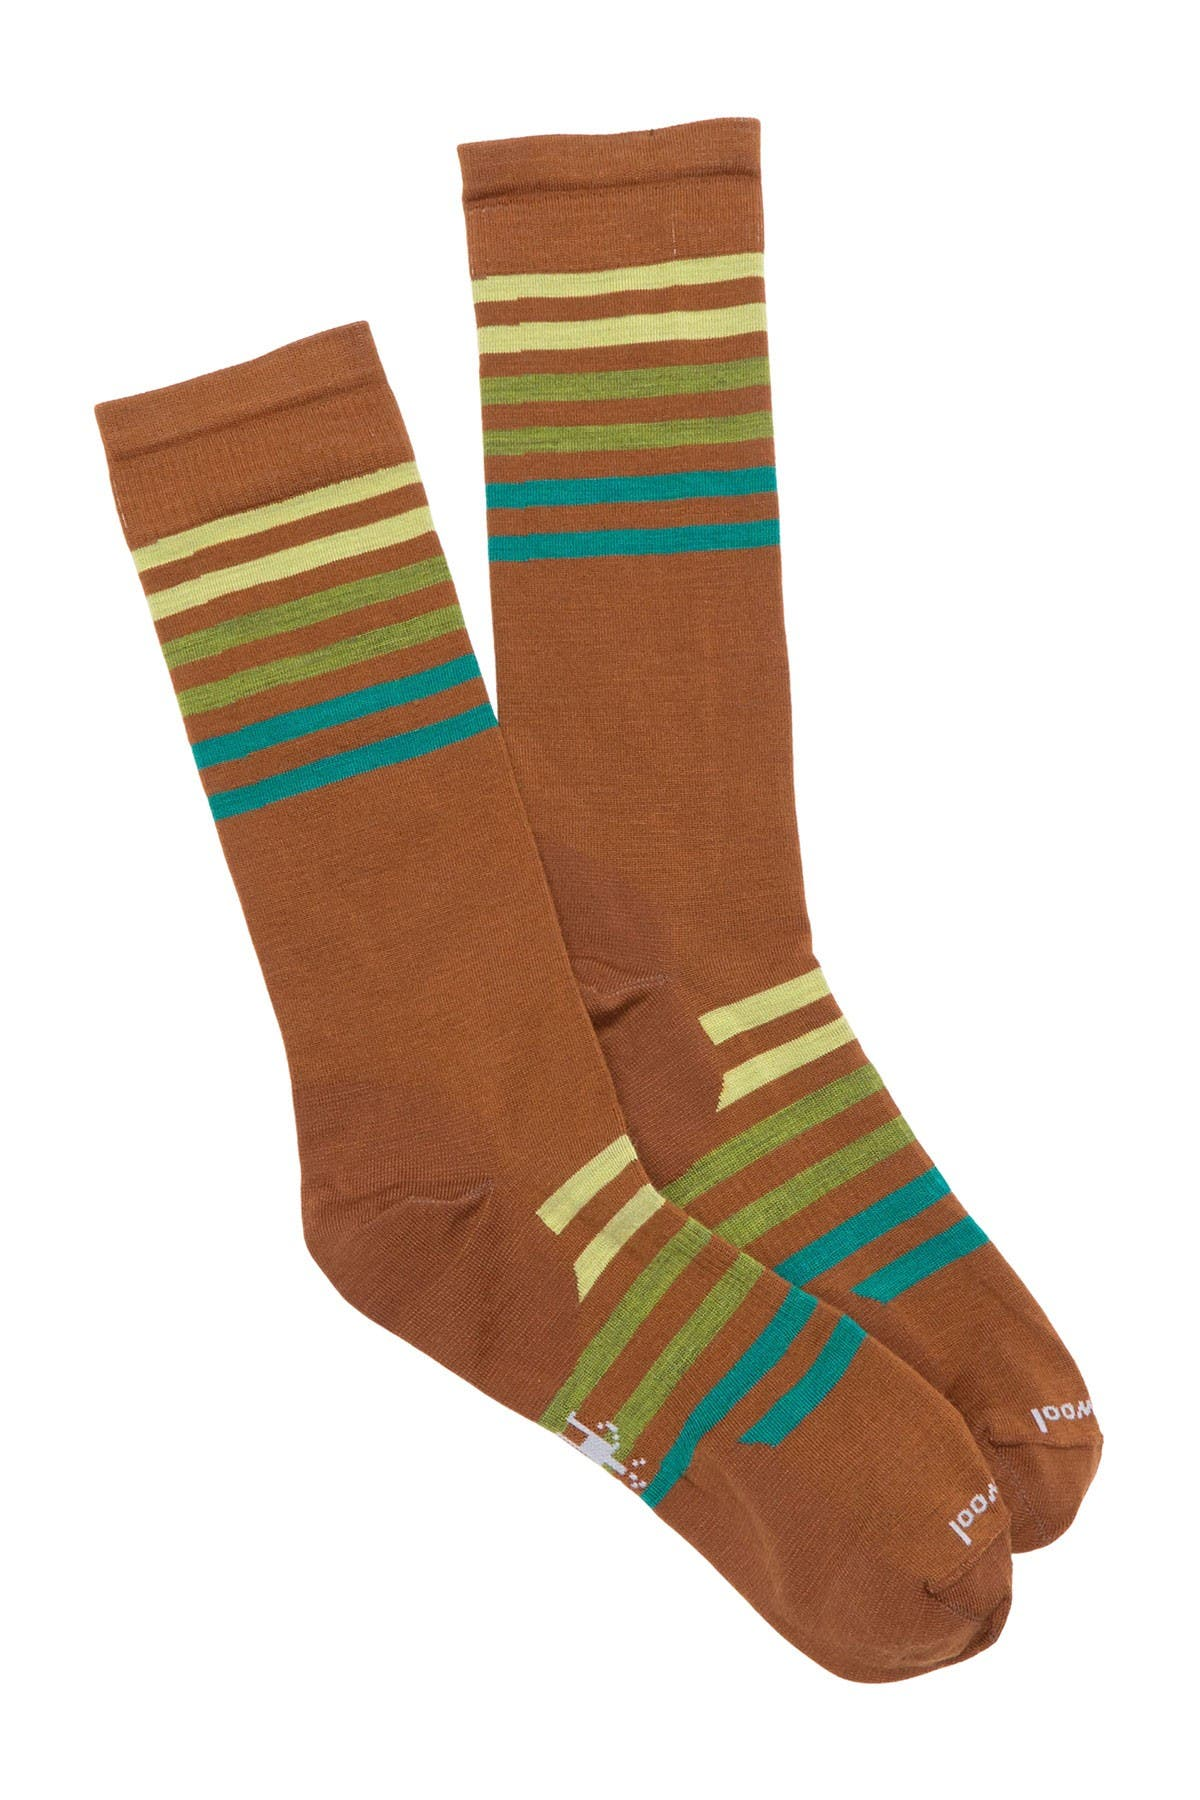 Image of SmartWool Spruce Street Striped Crew Socks